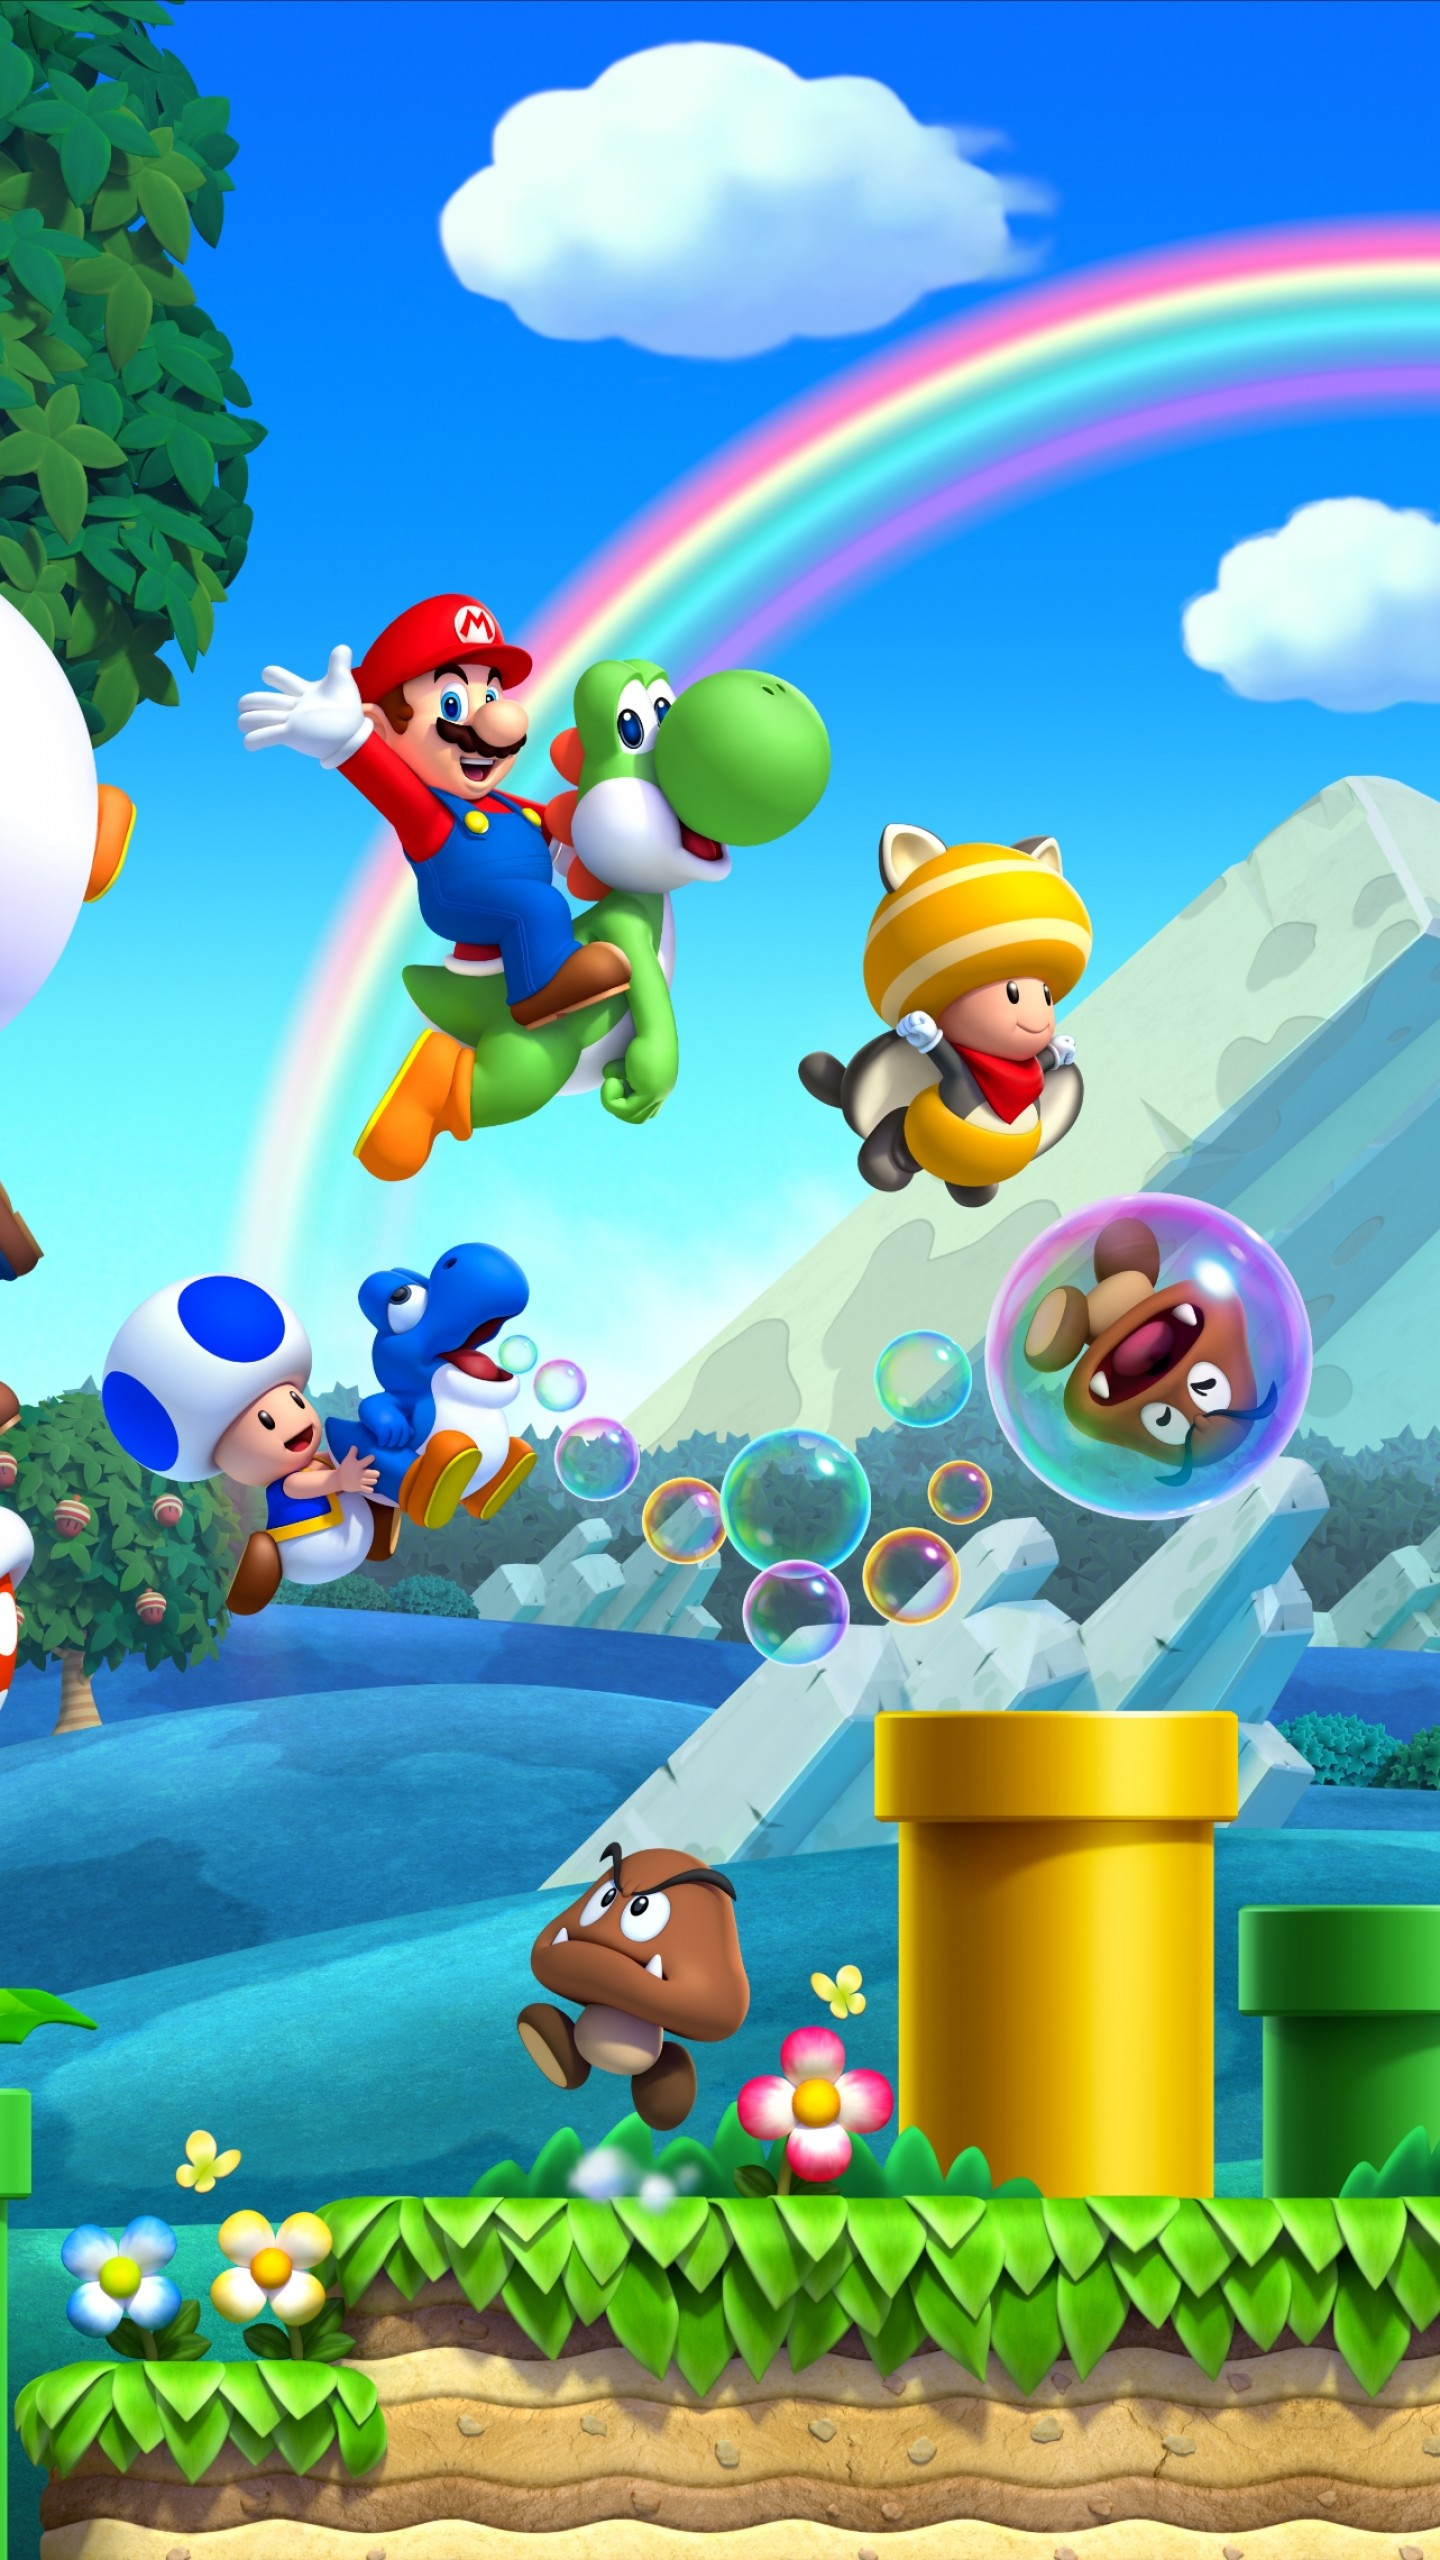 Wallpaper Super Mario Odyssey, 4k, 5k, E3 2017, Games #13716